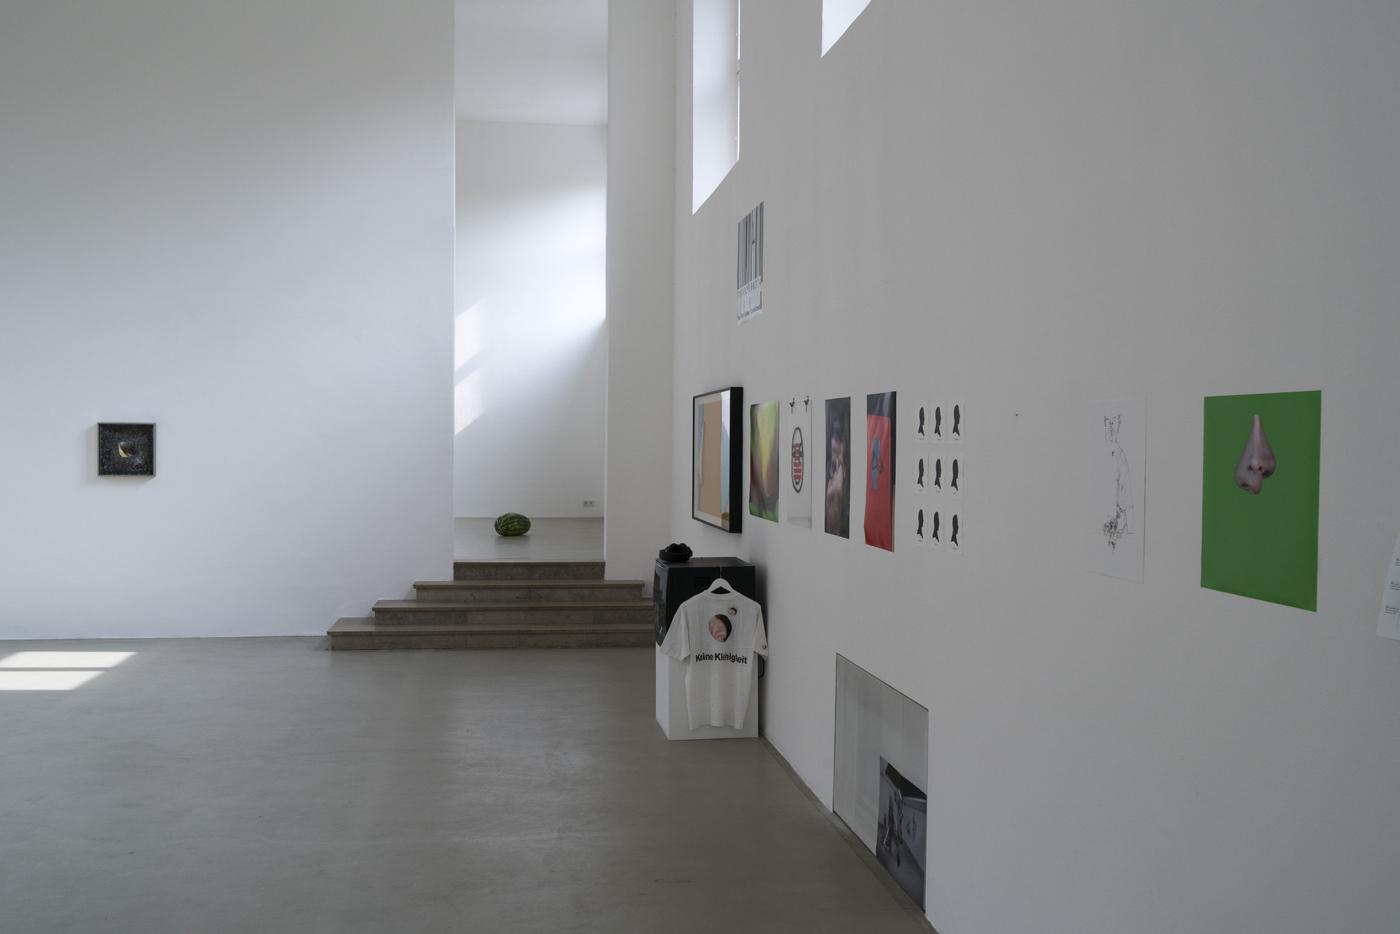 Darius Mikšys, Hayward & Tamayo, Exhibition View in Kunstverein München 2016 © Kunstverein München e.V.13